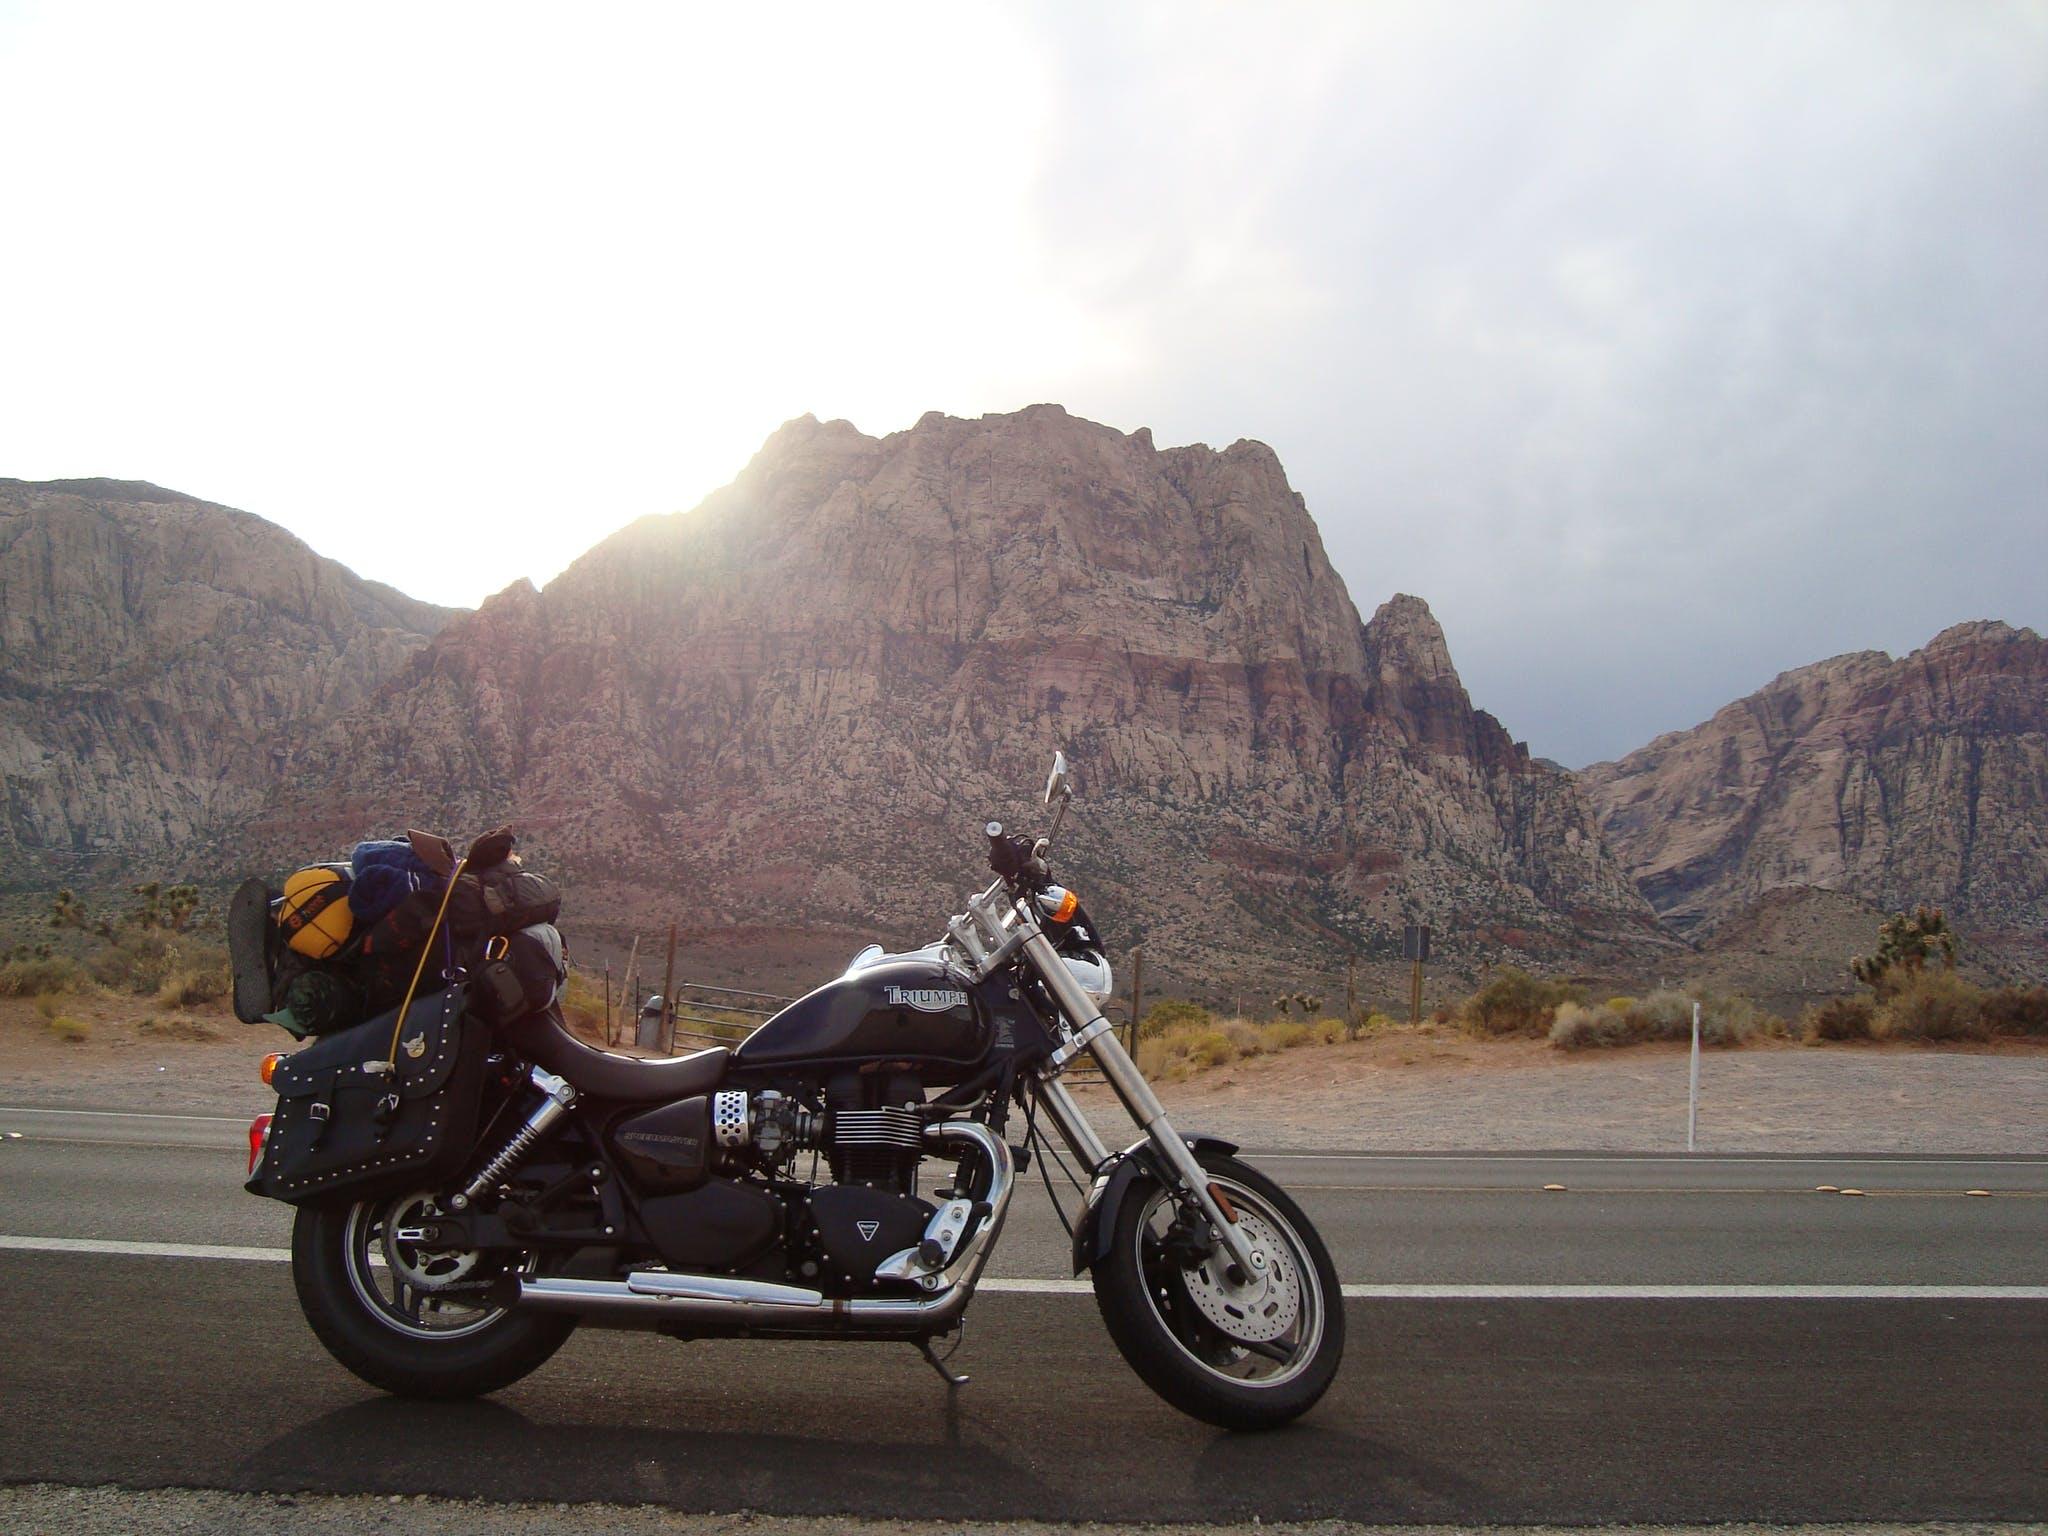 Free stock photo of motorcycle, road trip, Joe Leineweber